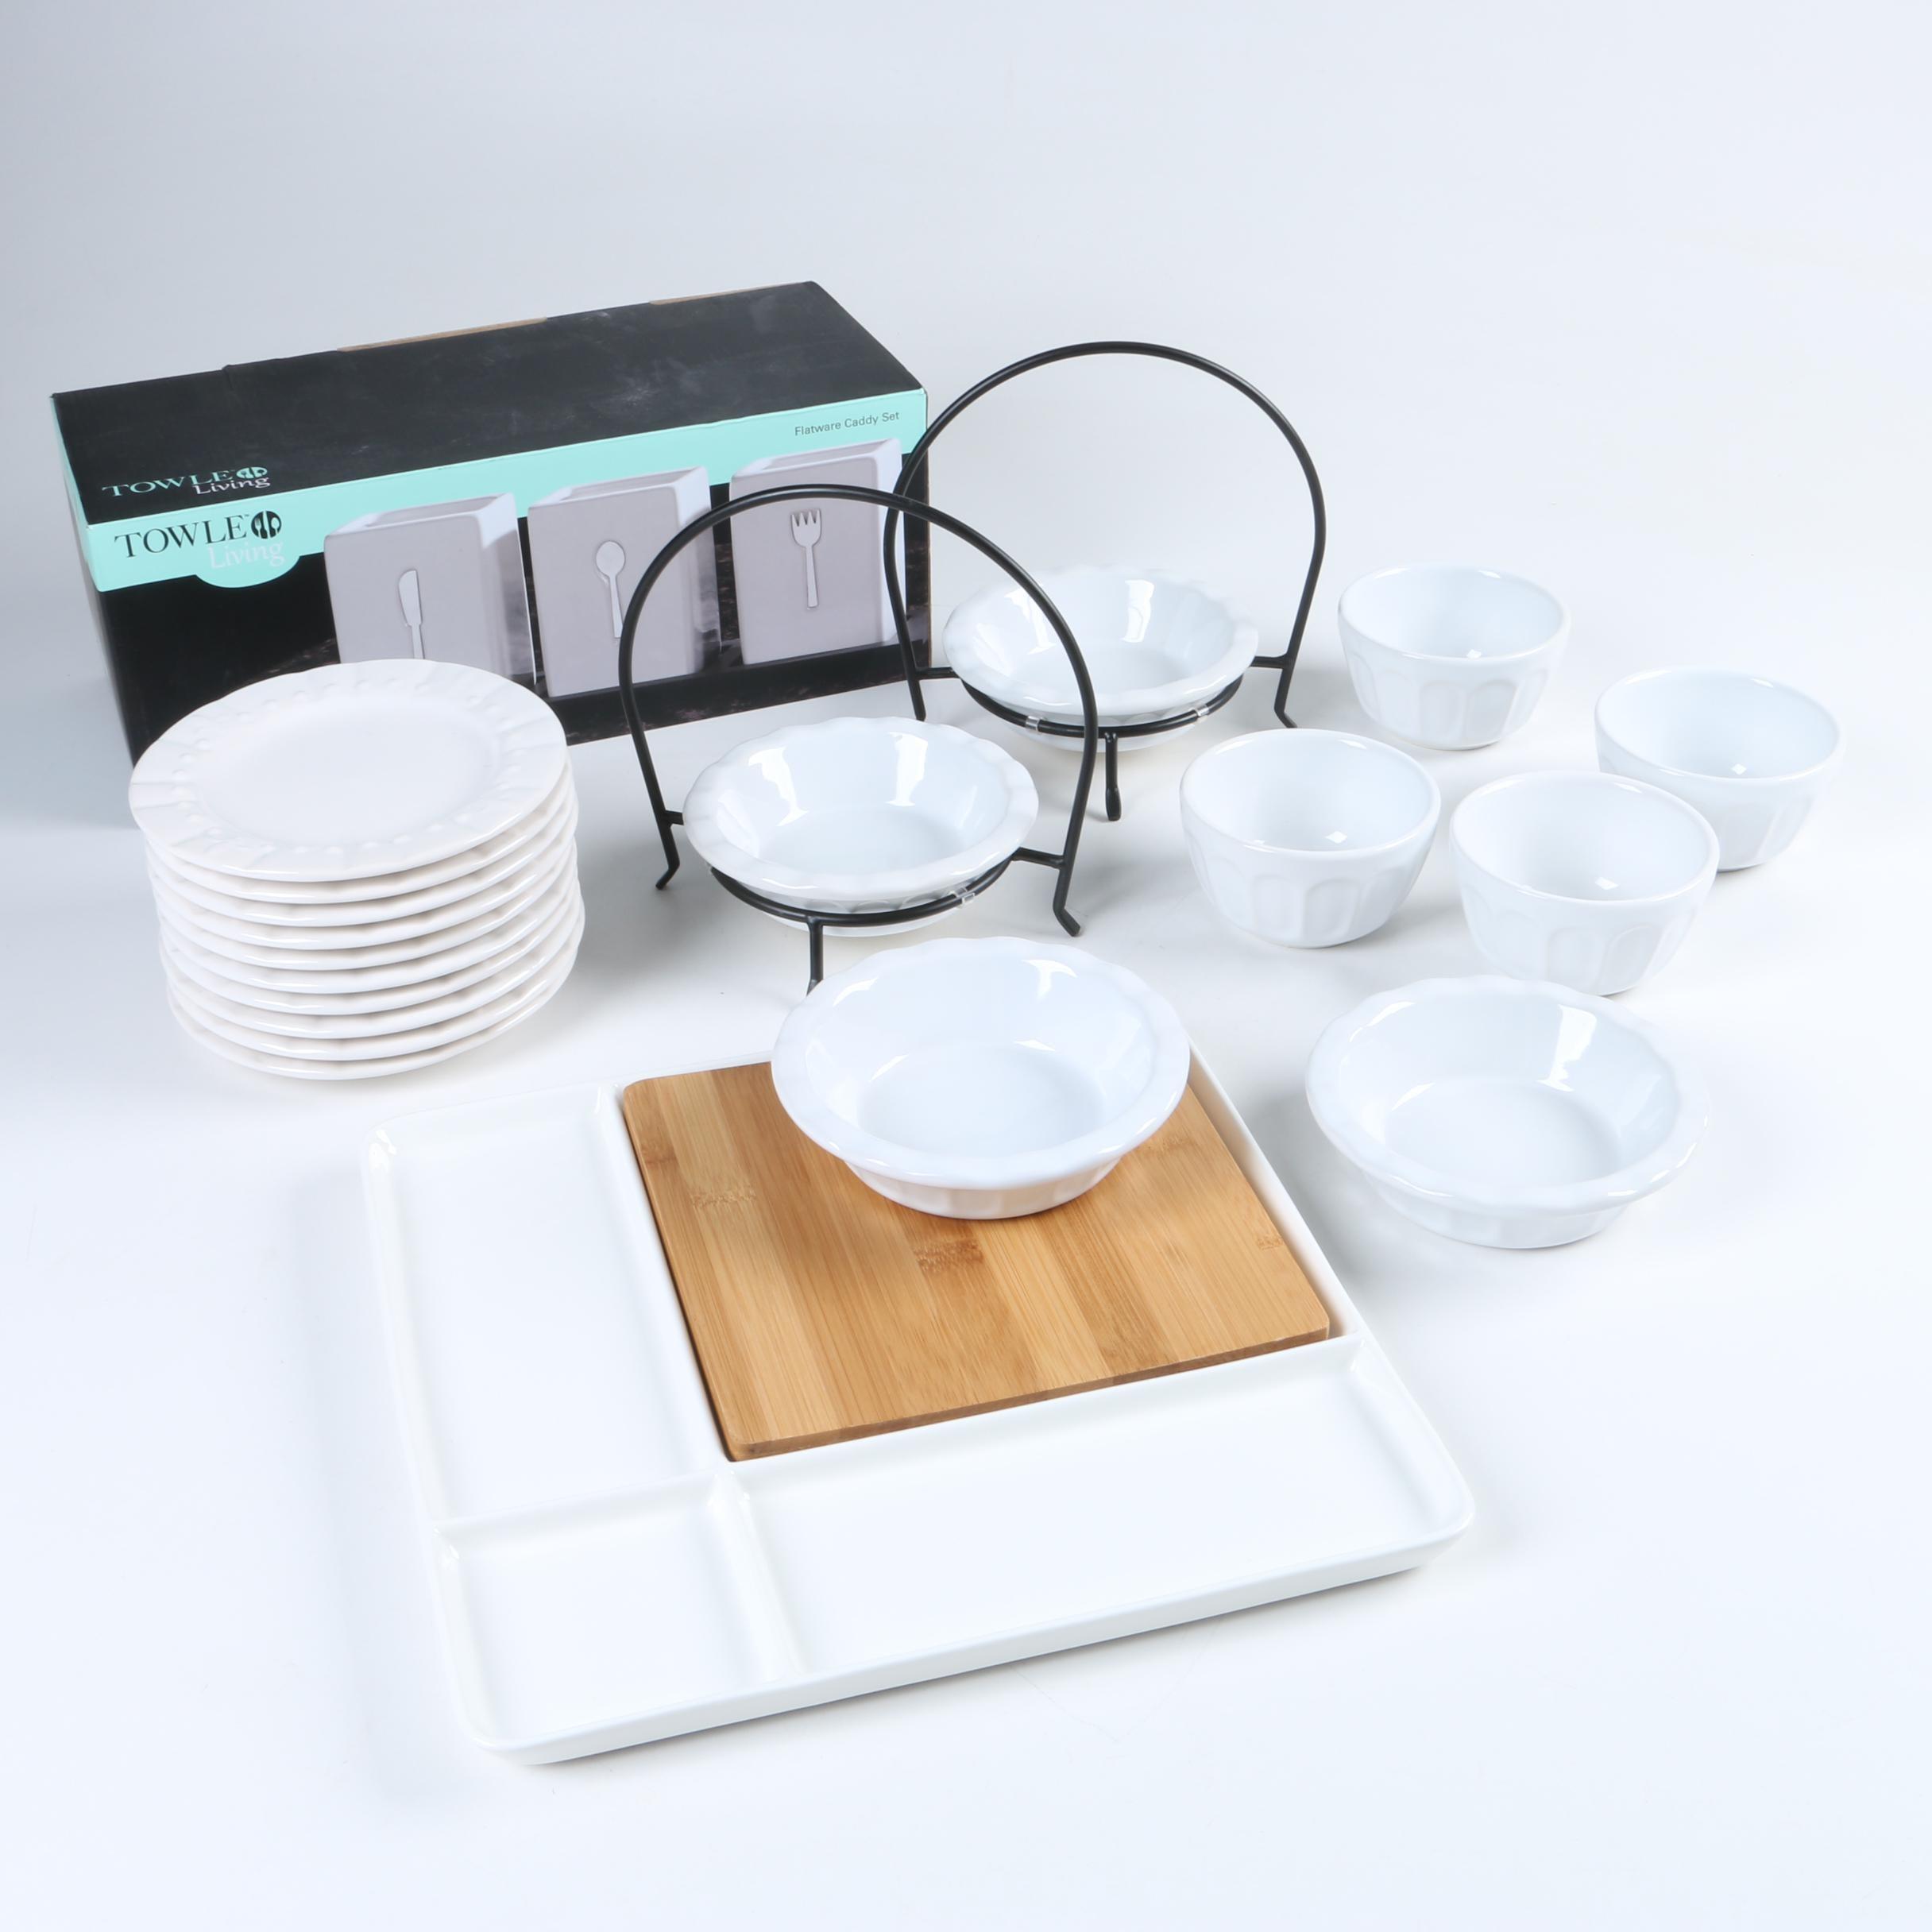 Contemporary Ceramic Tableware and Serveware ... & Contemporary Ceramic Tableware and Serveware : EBTH